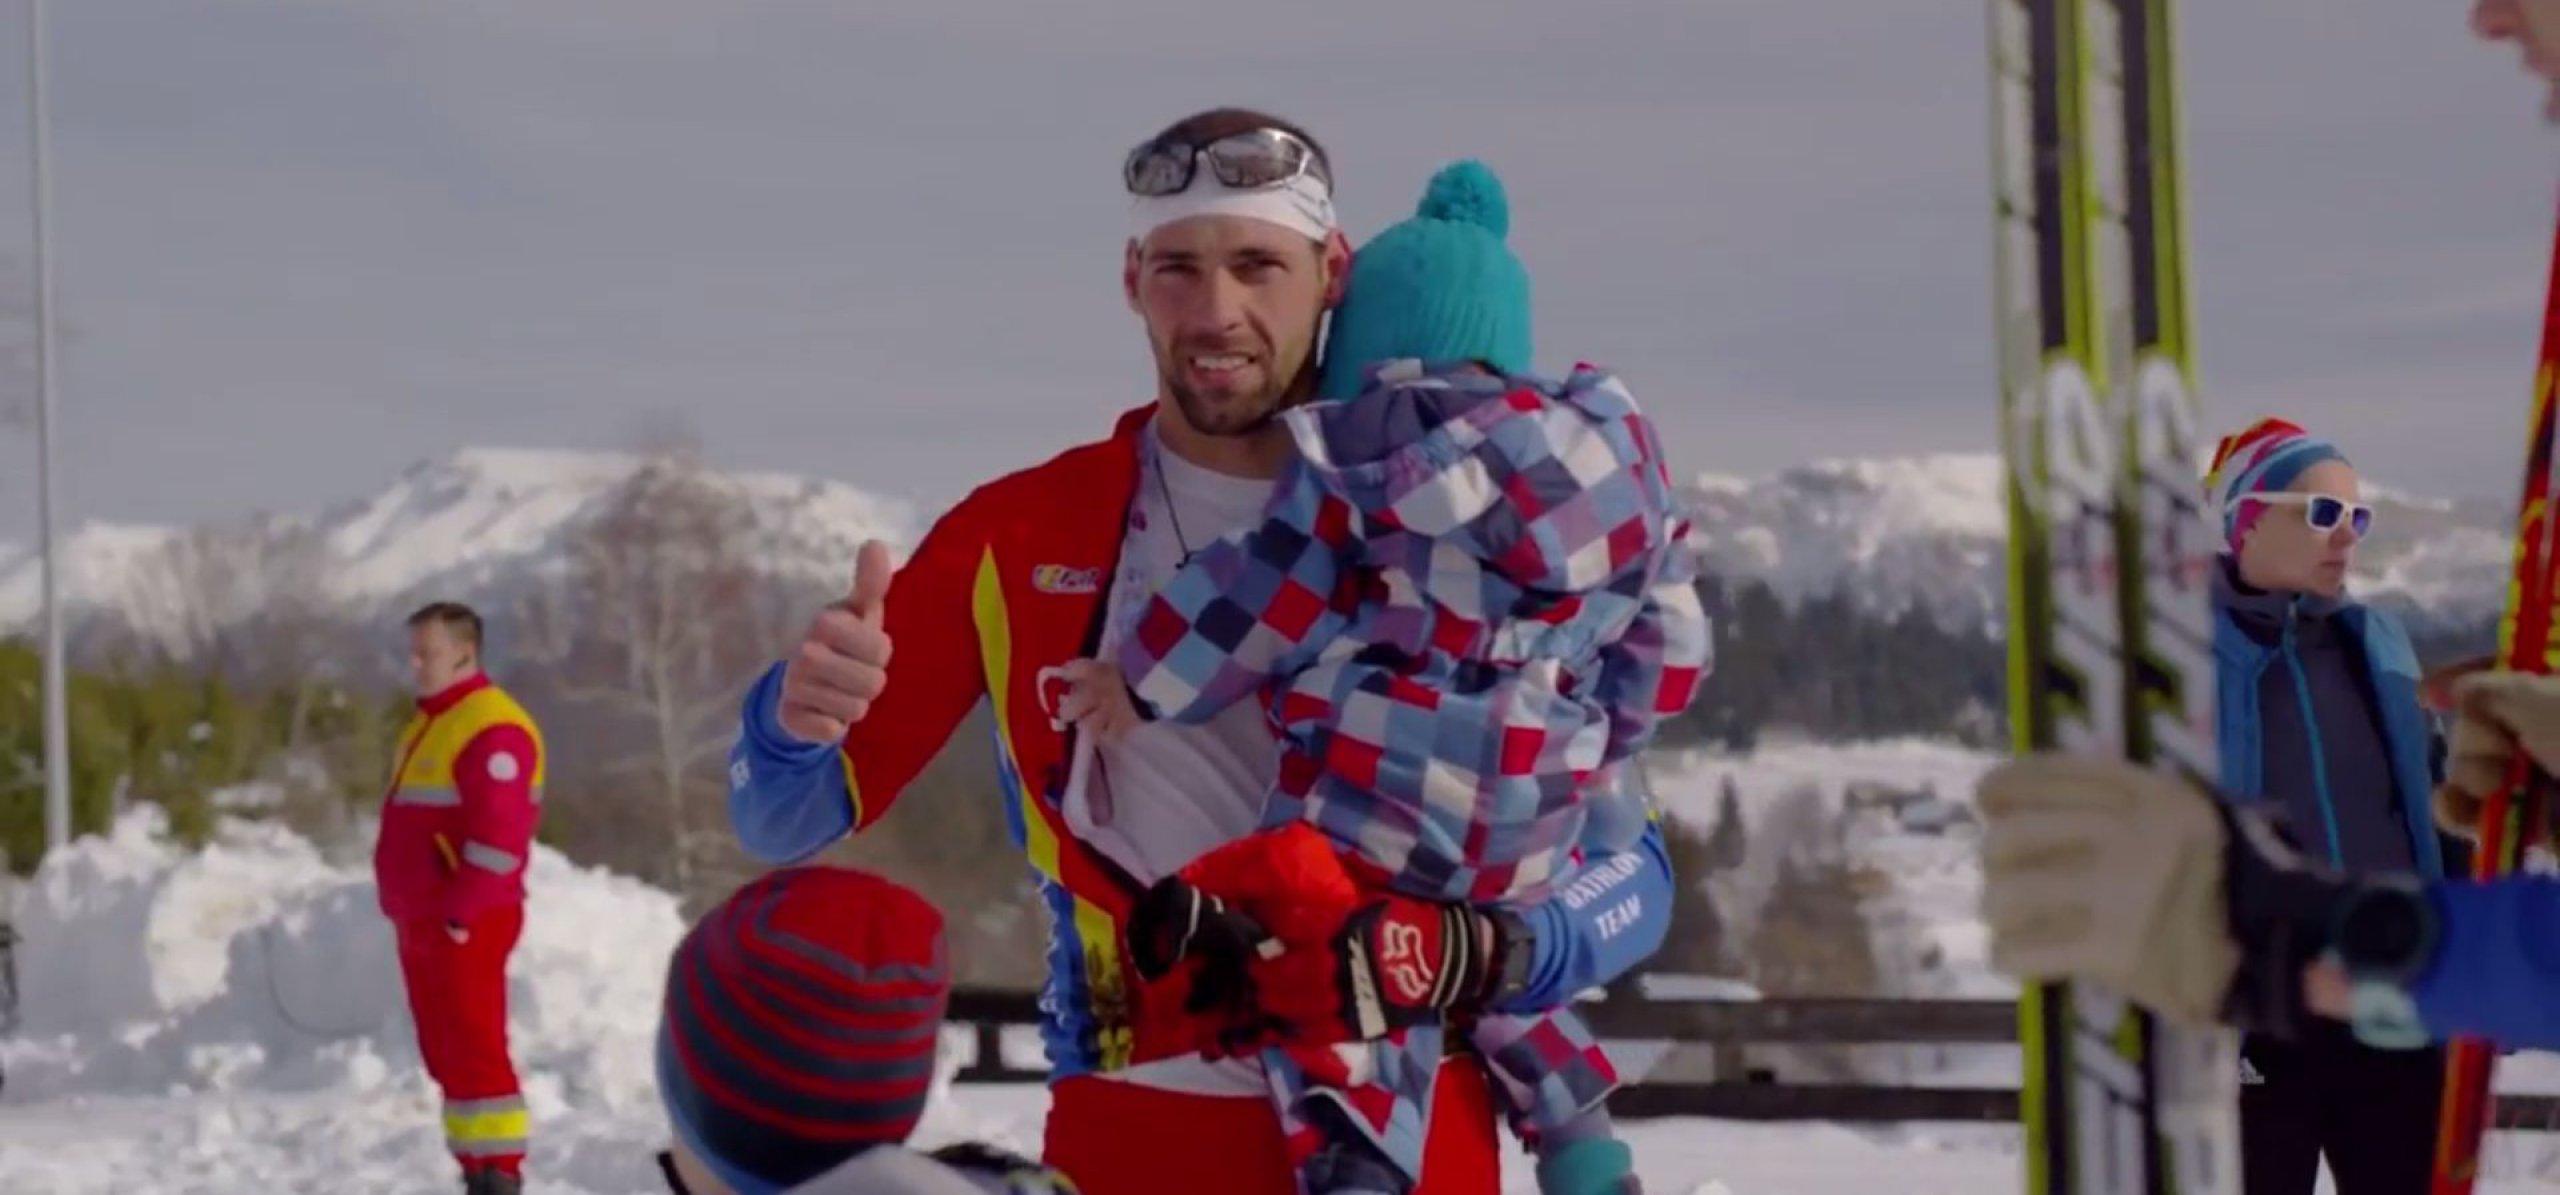 Campionatelor Europene de Winter Triathlon 2019